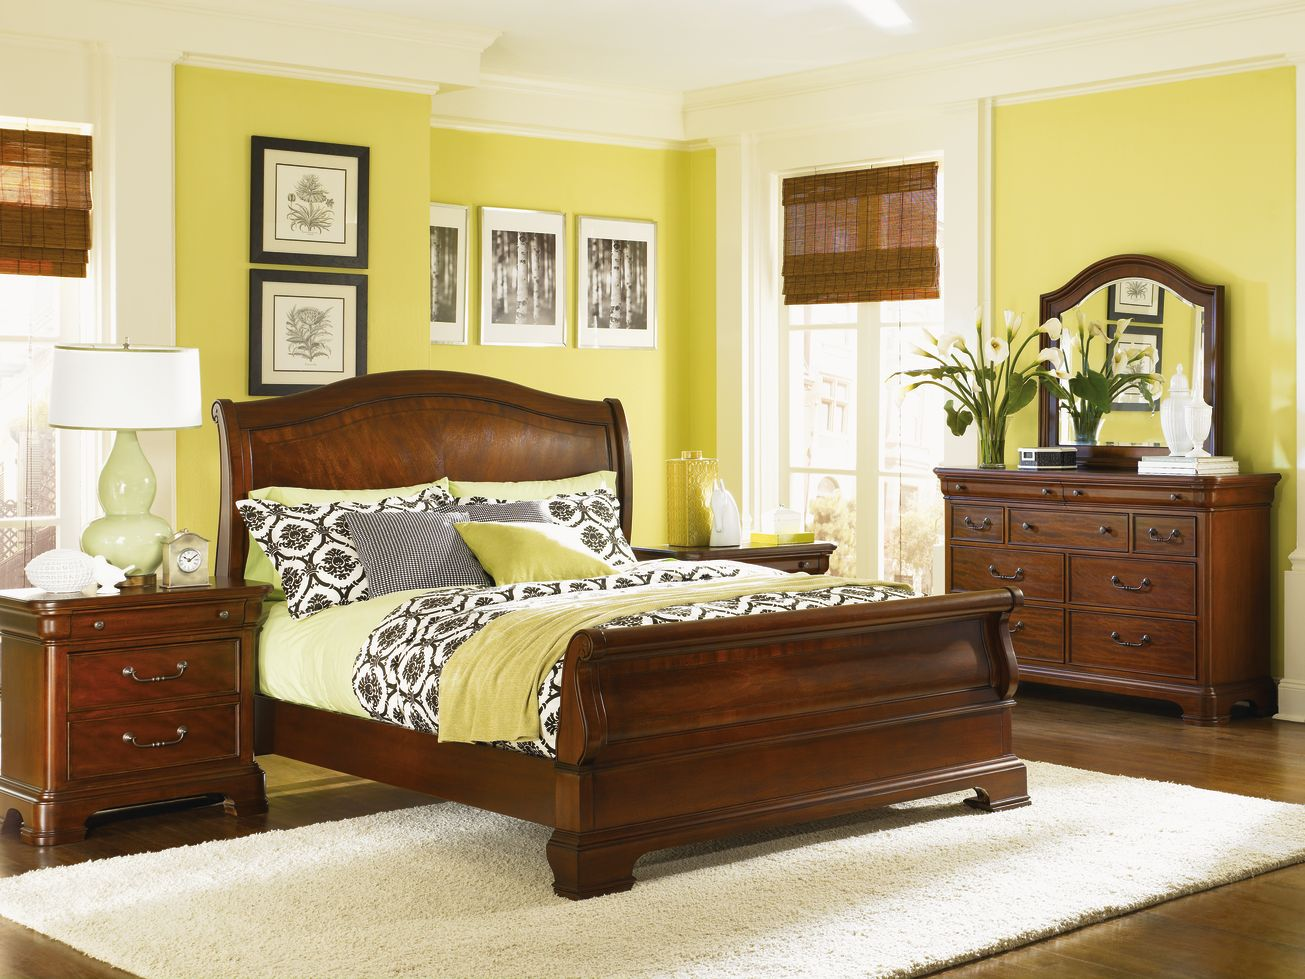 Bedroom Furniture - Dreamland Mattress & Furniture